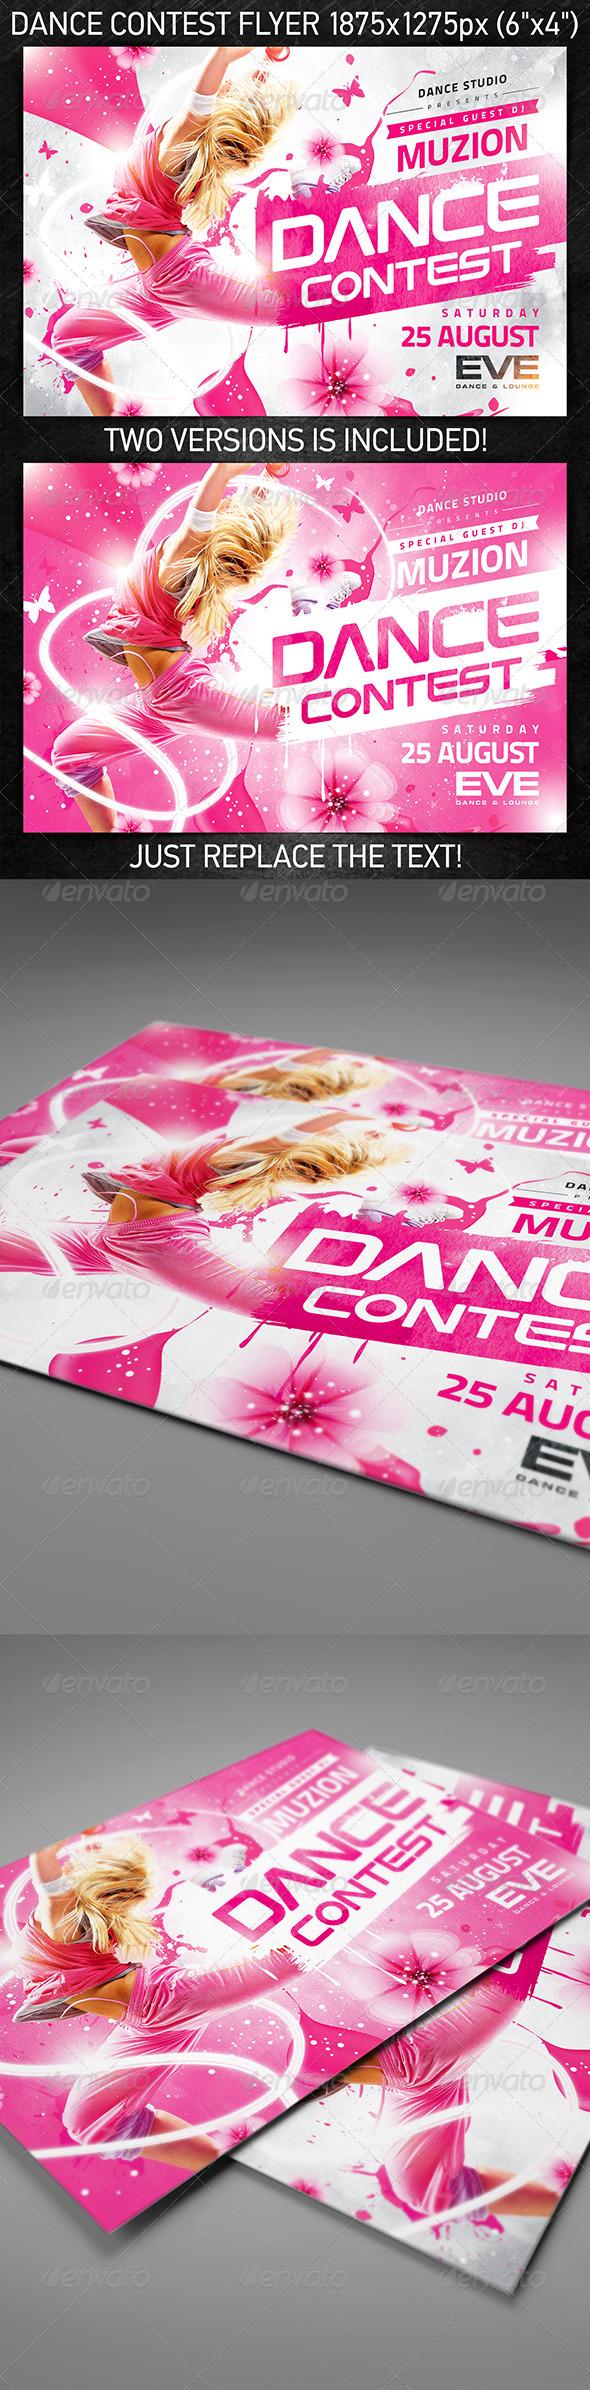 Dance Contest Flyer vol.2 - Clubs & Parties Events